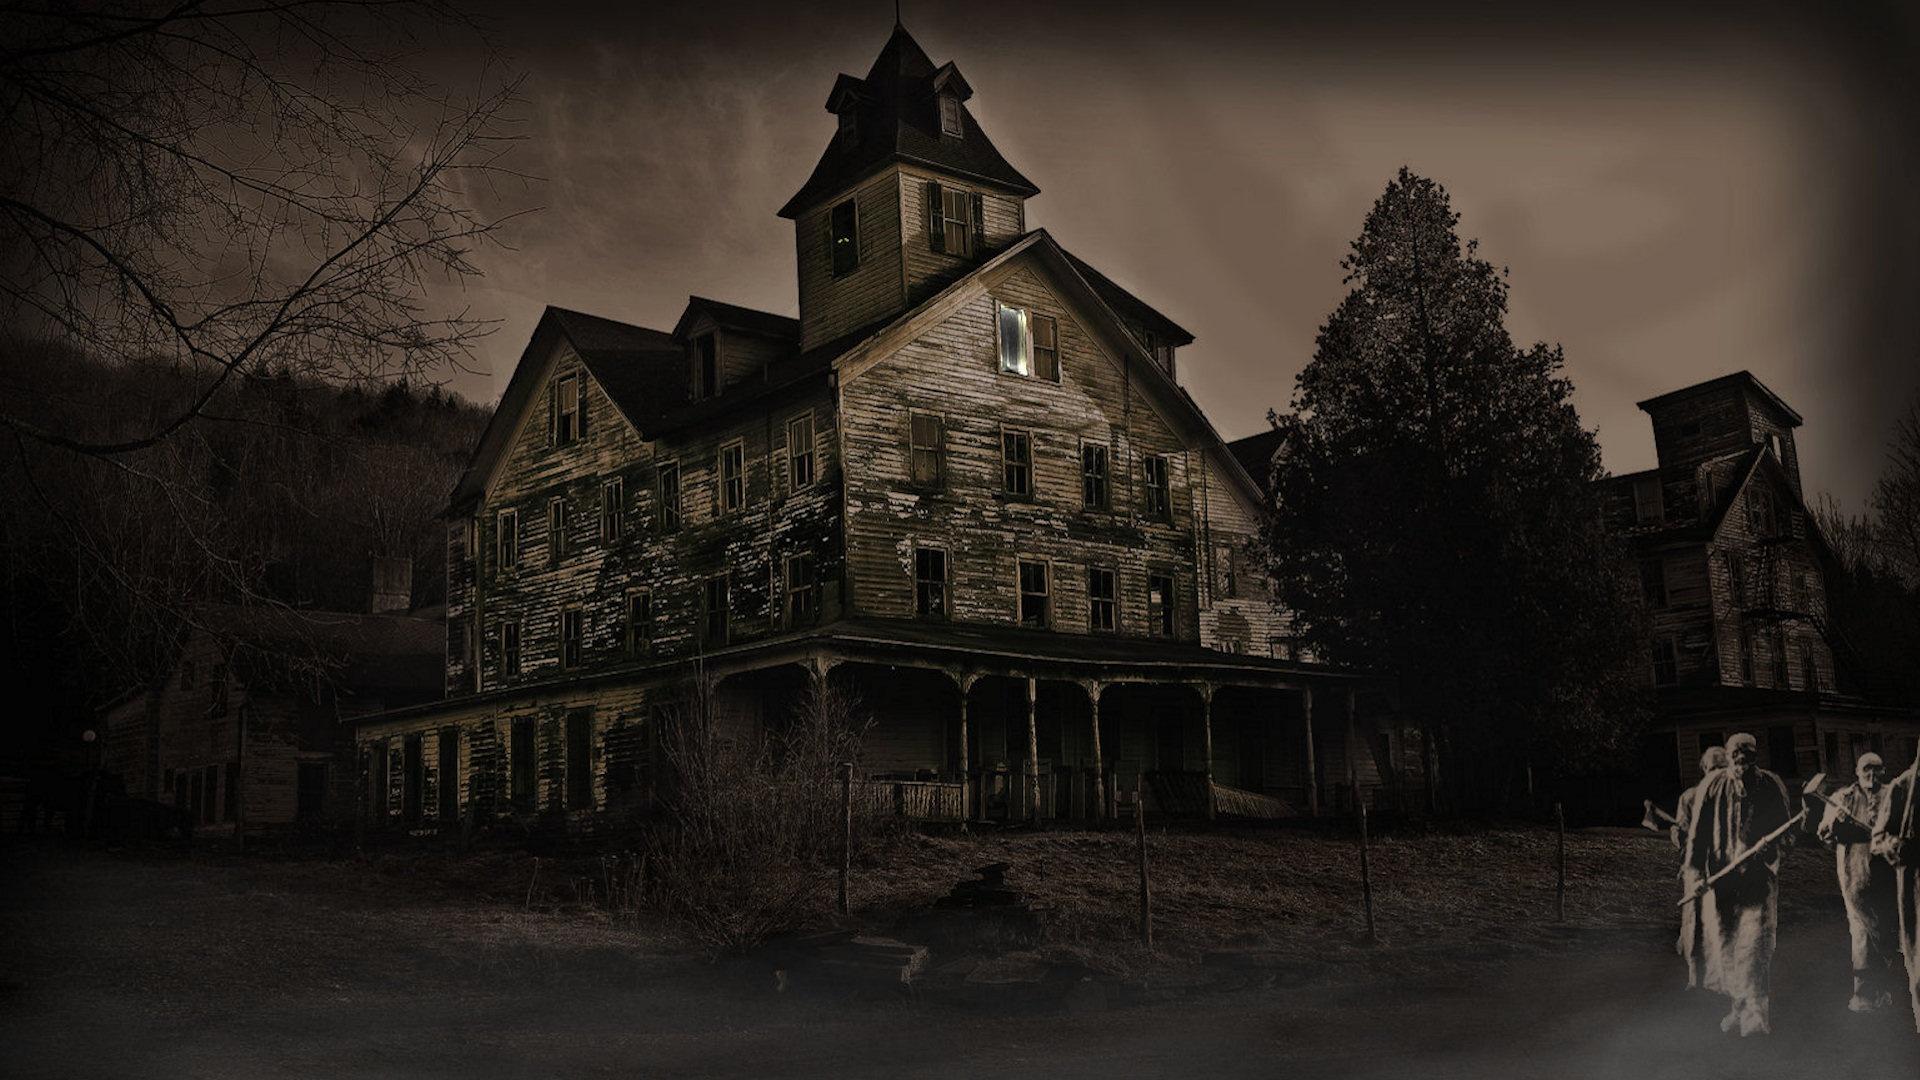 wallpaper house wallpapers haunted halloween 1920x1080 1920x1080